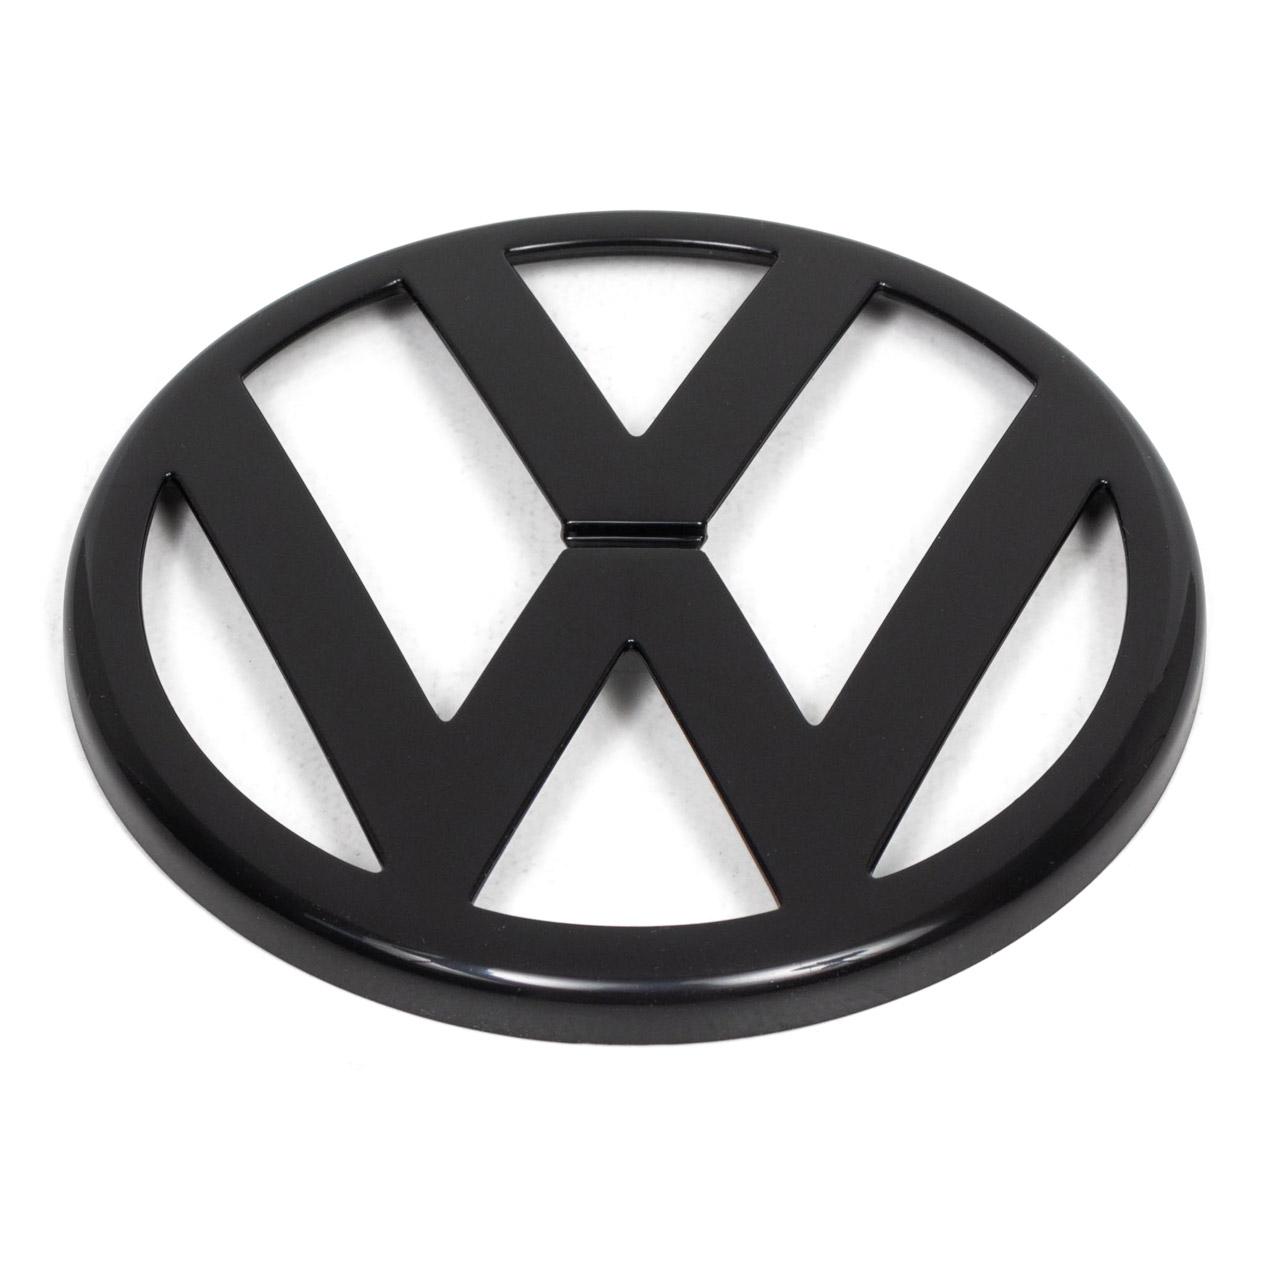 ORIGINAL VW Emblem Logo Symbol Kühlergrill Schwarz Golf 4 MK4 1J0853601A 041